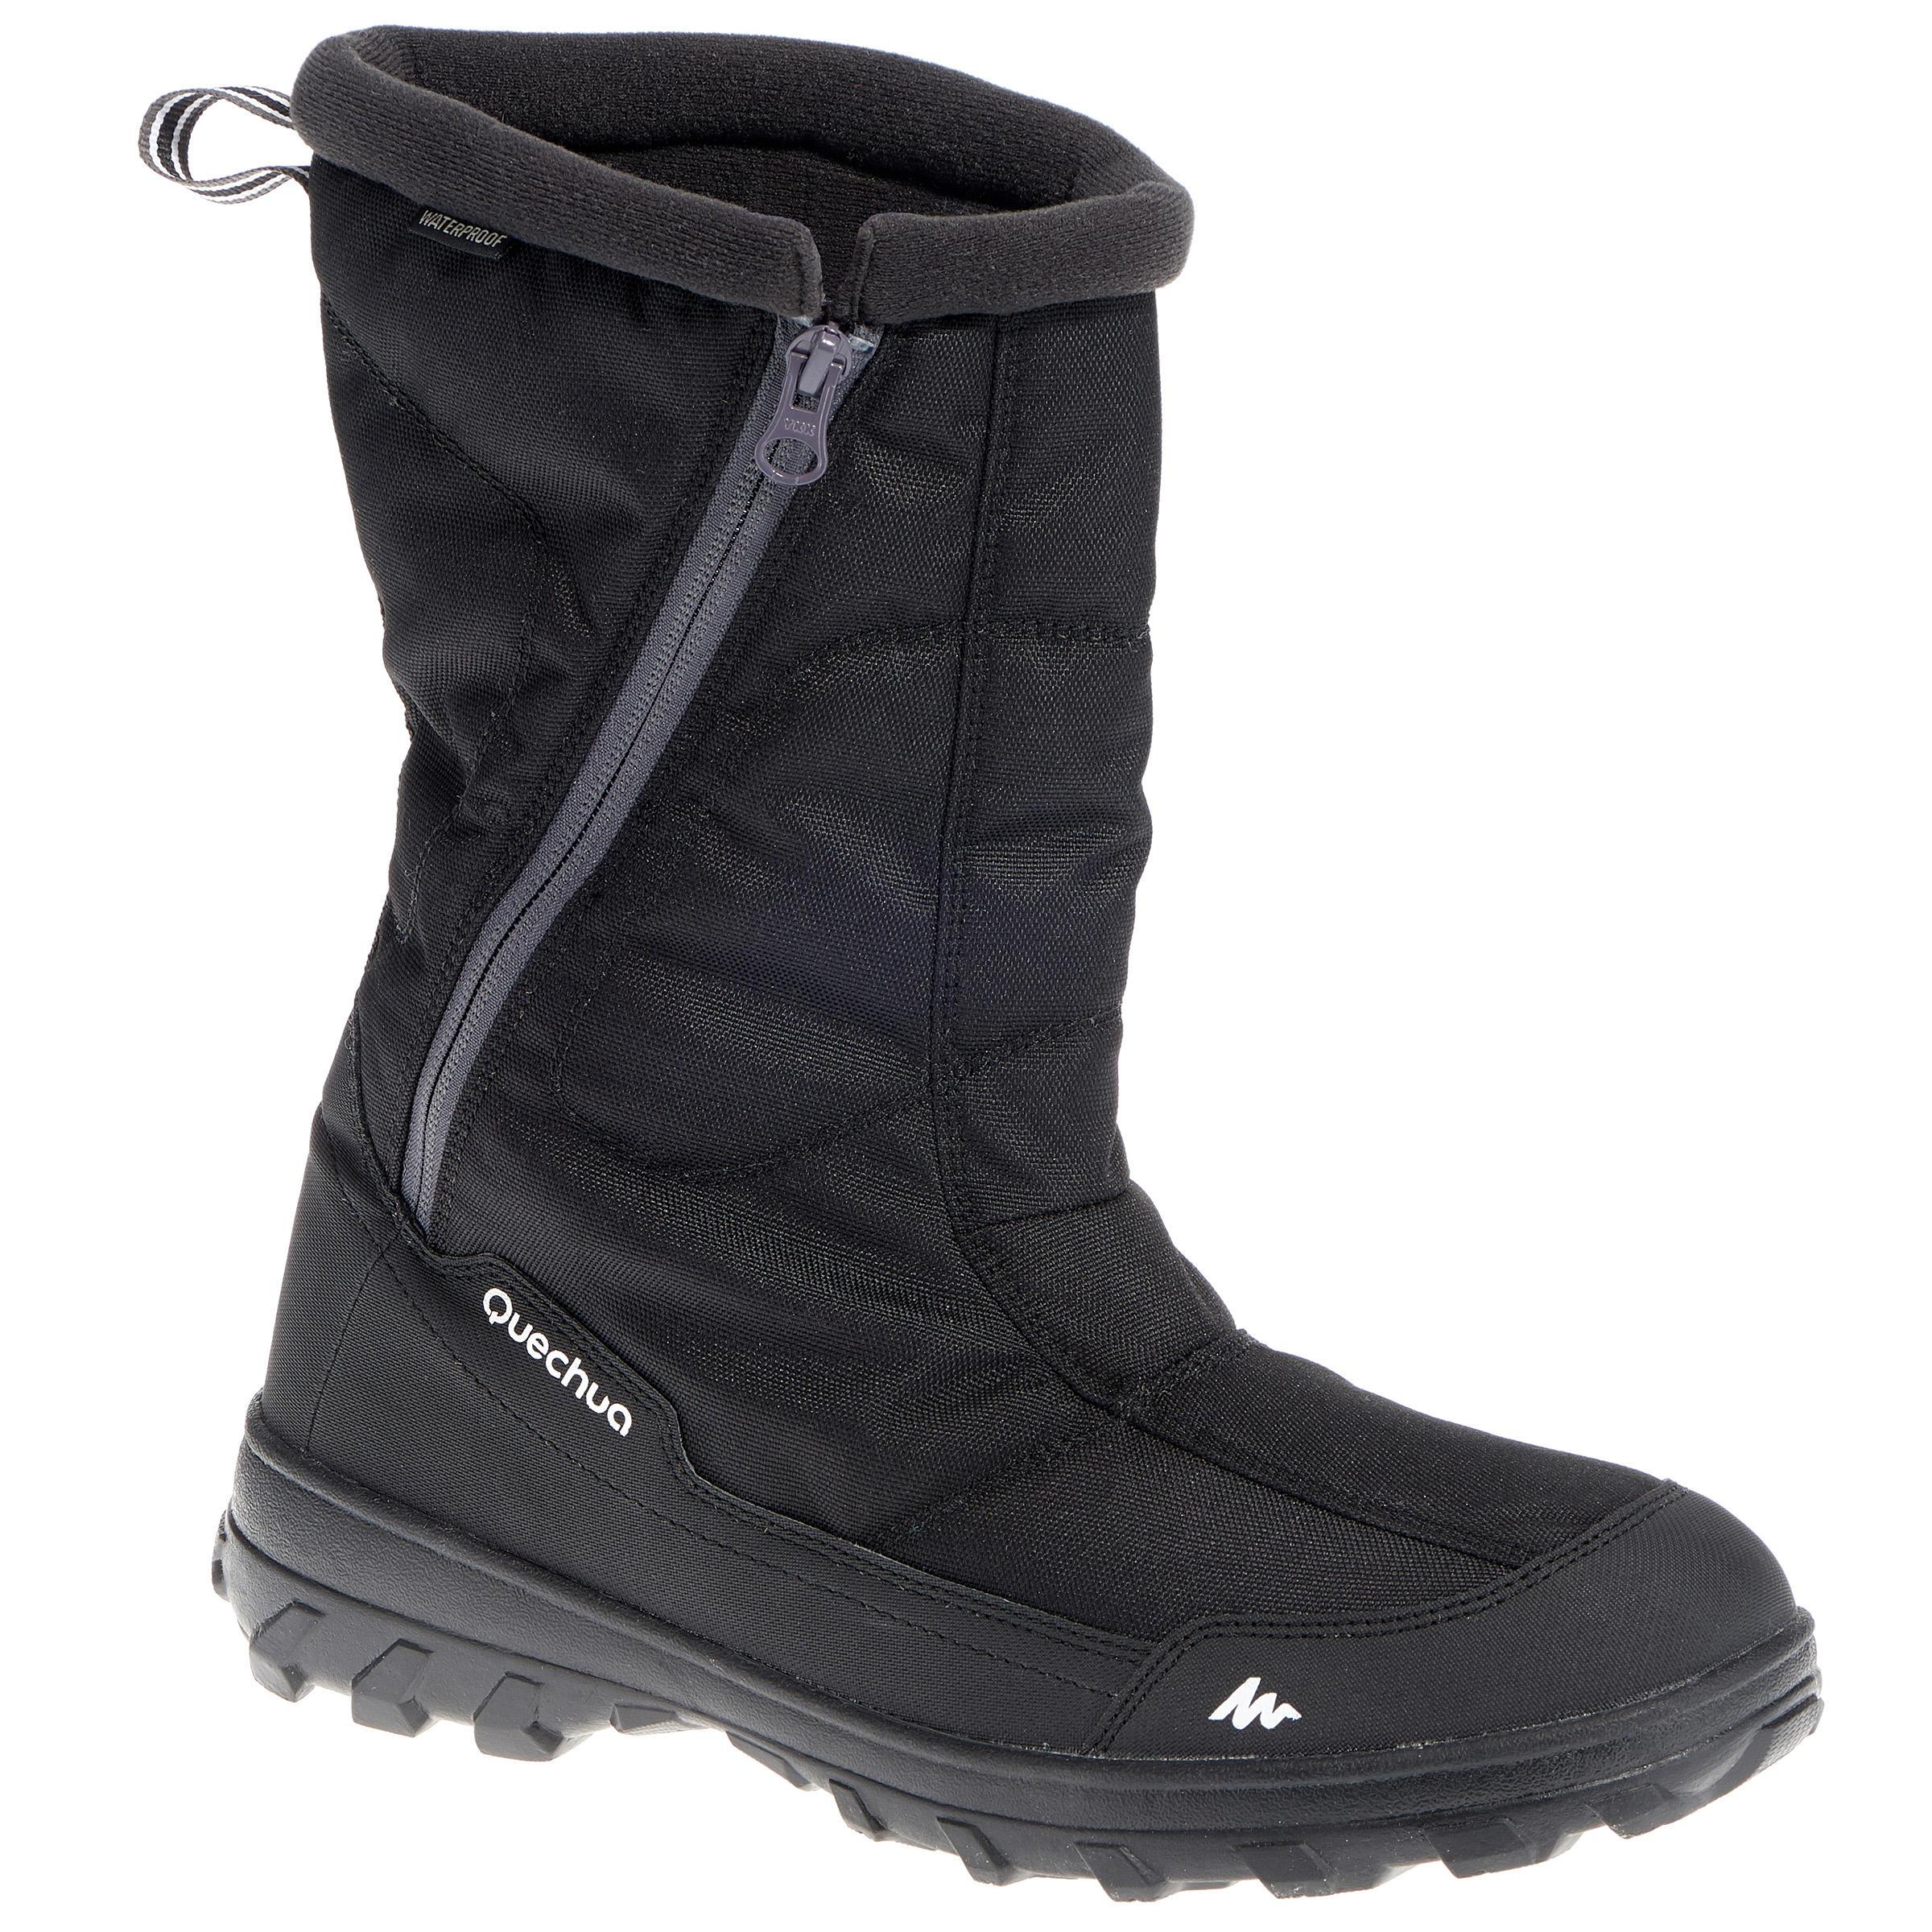 Botas de senderismo en la nieve para hombre SH500 cálidas e impermeables negro